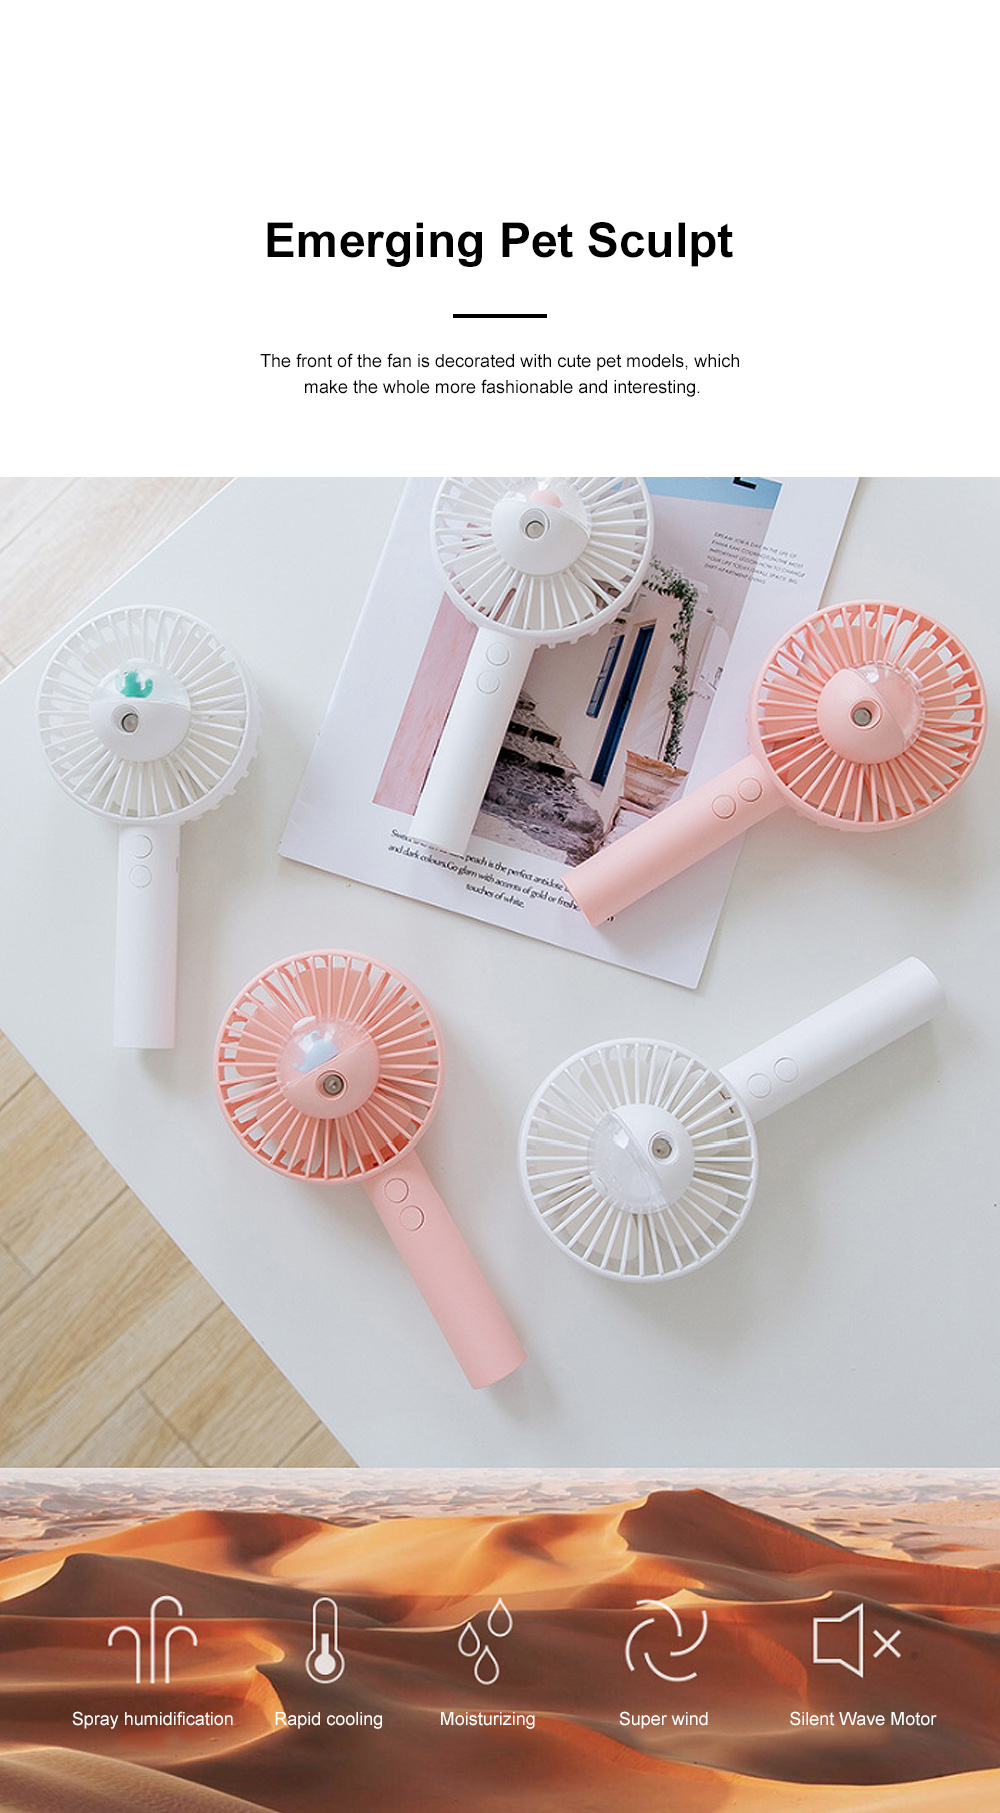 Portable Handheld Fan Cartoon Air Moistening Spray Fan Outdoor Portable Handheld Fan Creative Mini USB Cooler for Summer 5